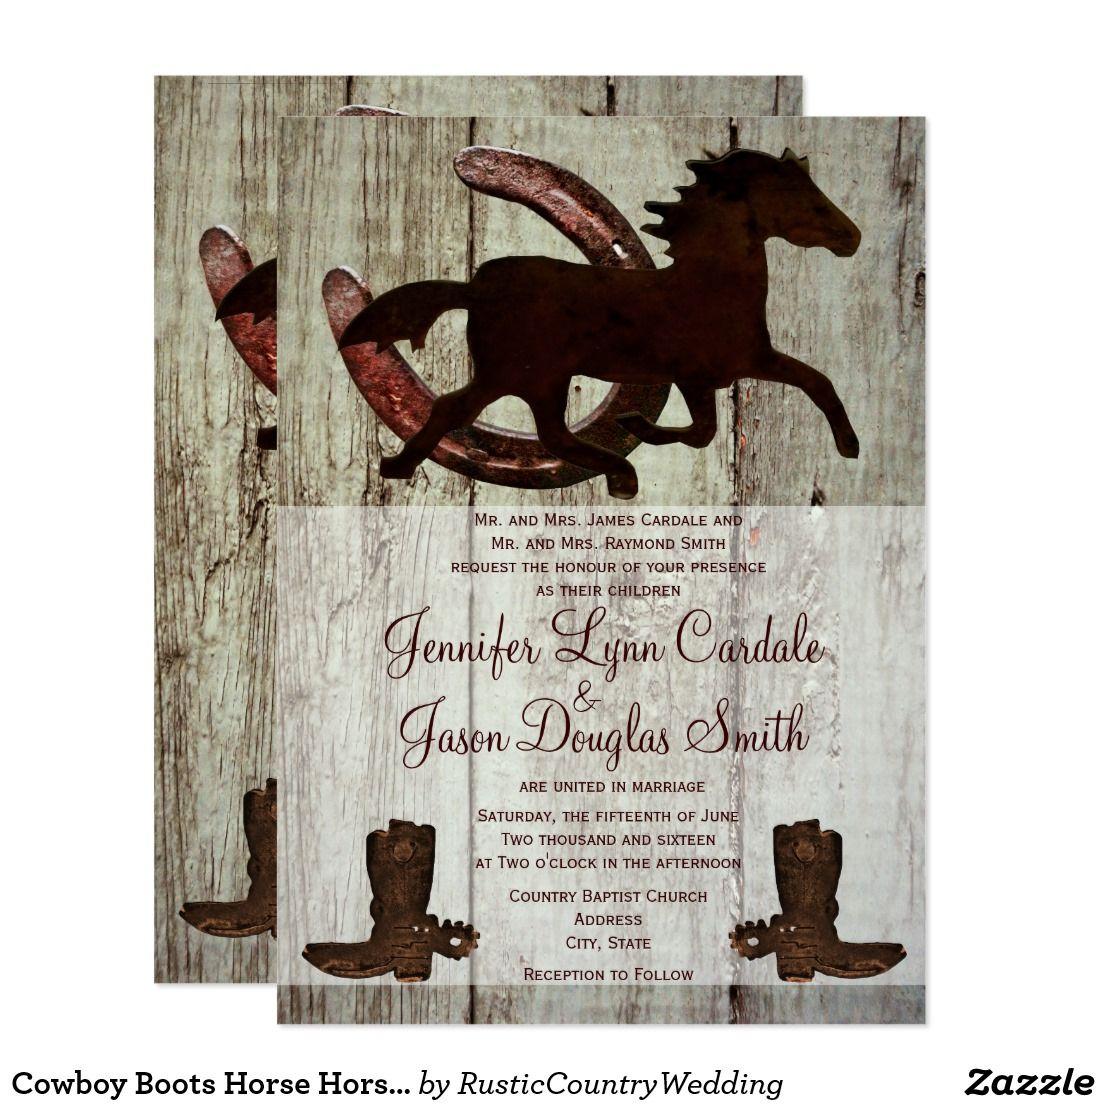 Cowboy Boots Horse Horseshoe Wedding Invitations Wedding Country